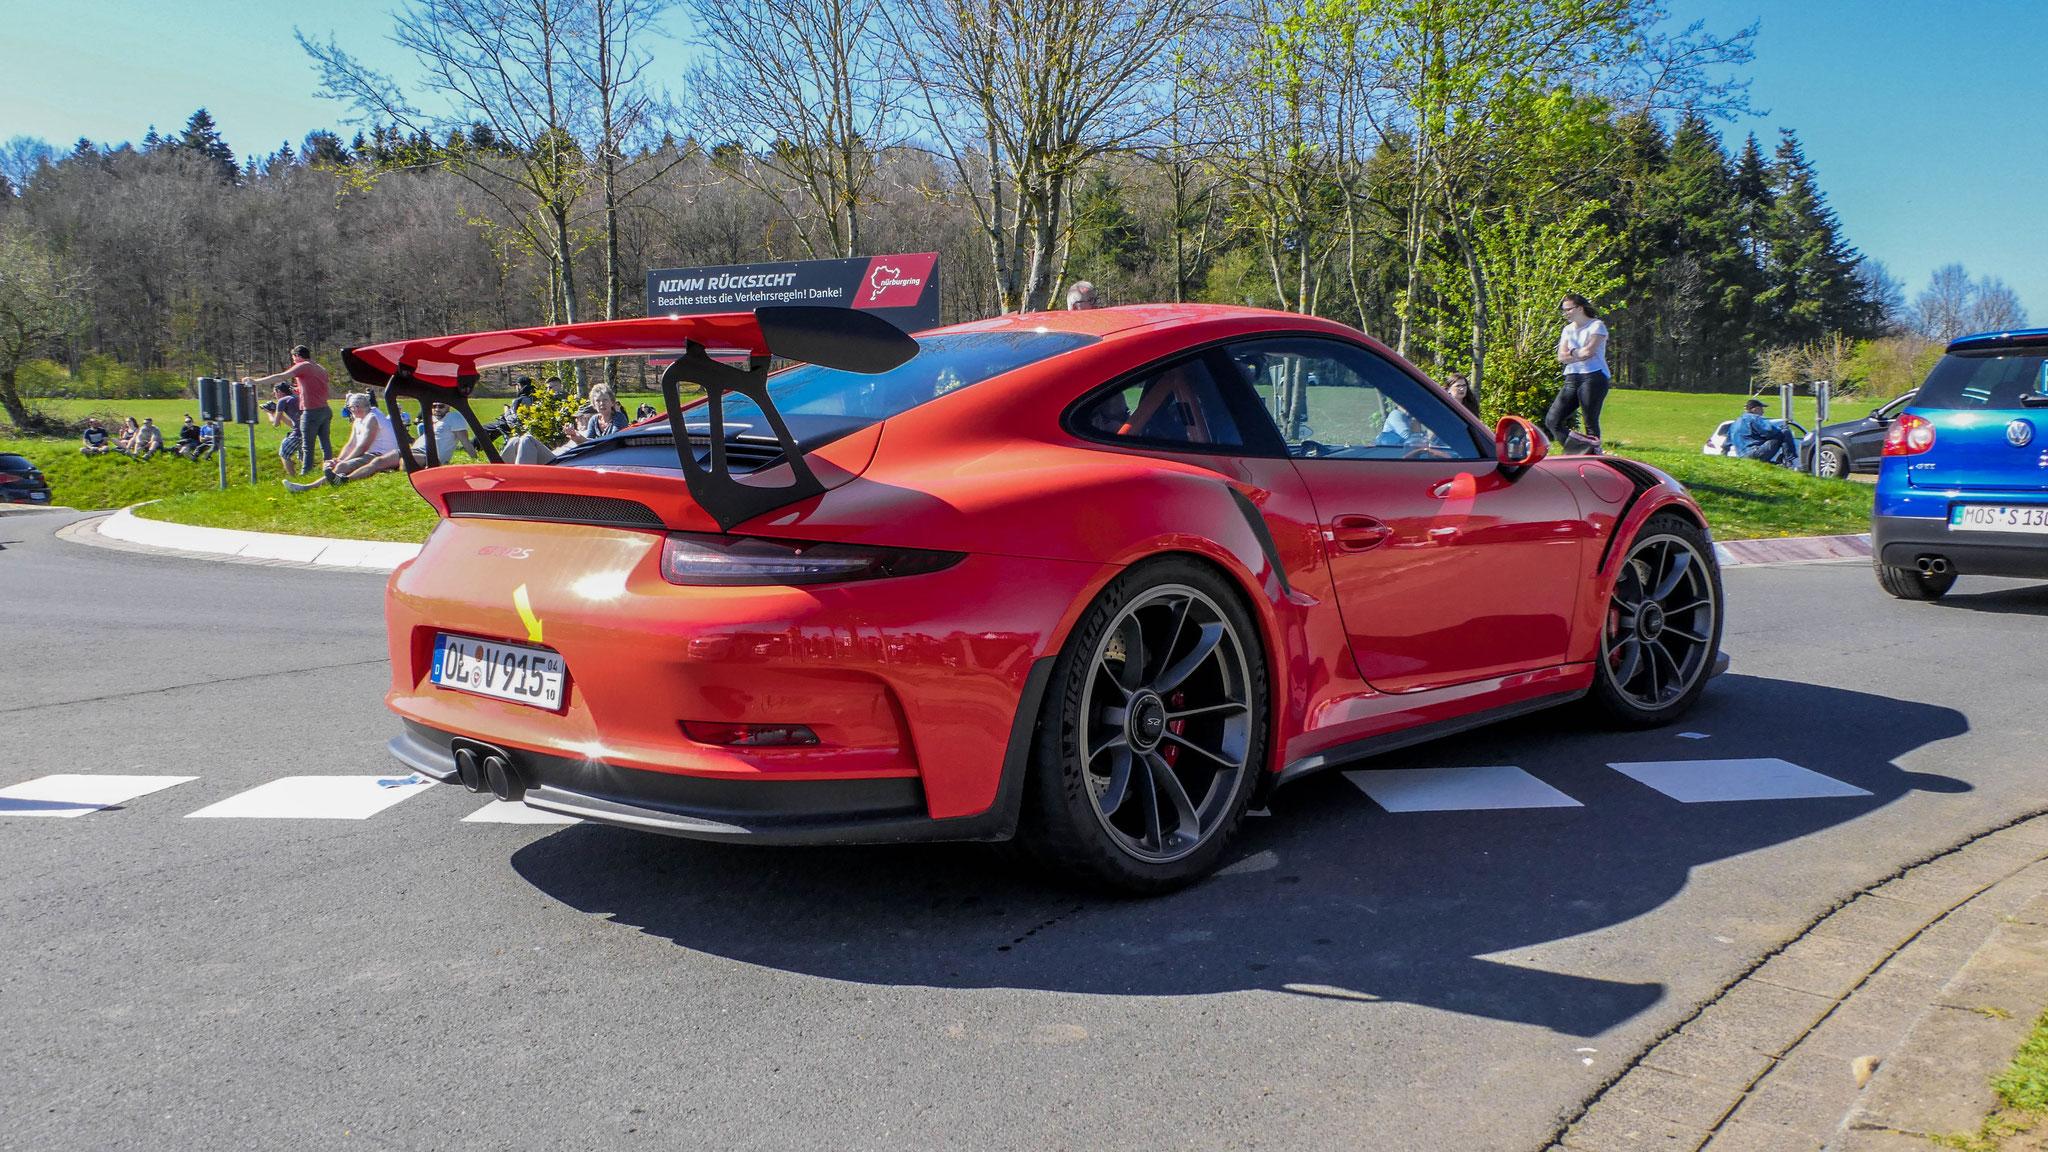 Porsche 911 GT3 RS - OL-V-915